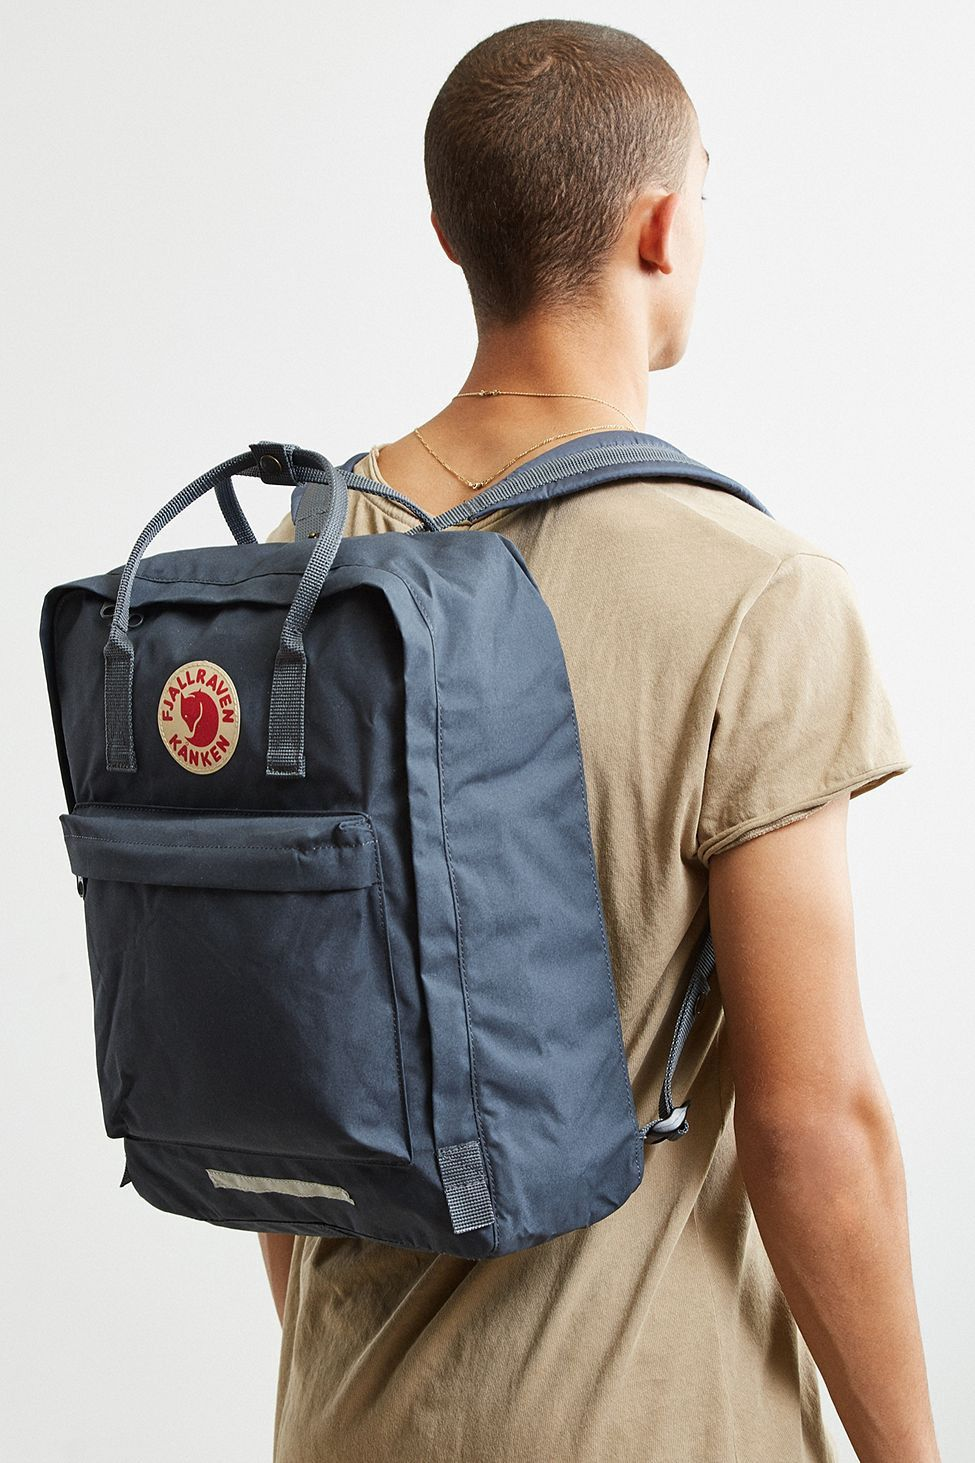 a91958838 Urban Outfitters Fjallraven Kanken Big Backpack - Dark Grey One Size ...